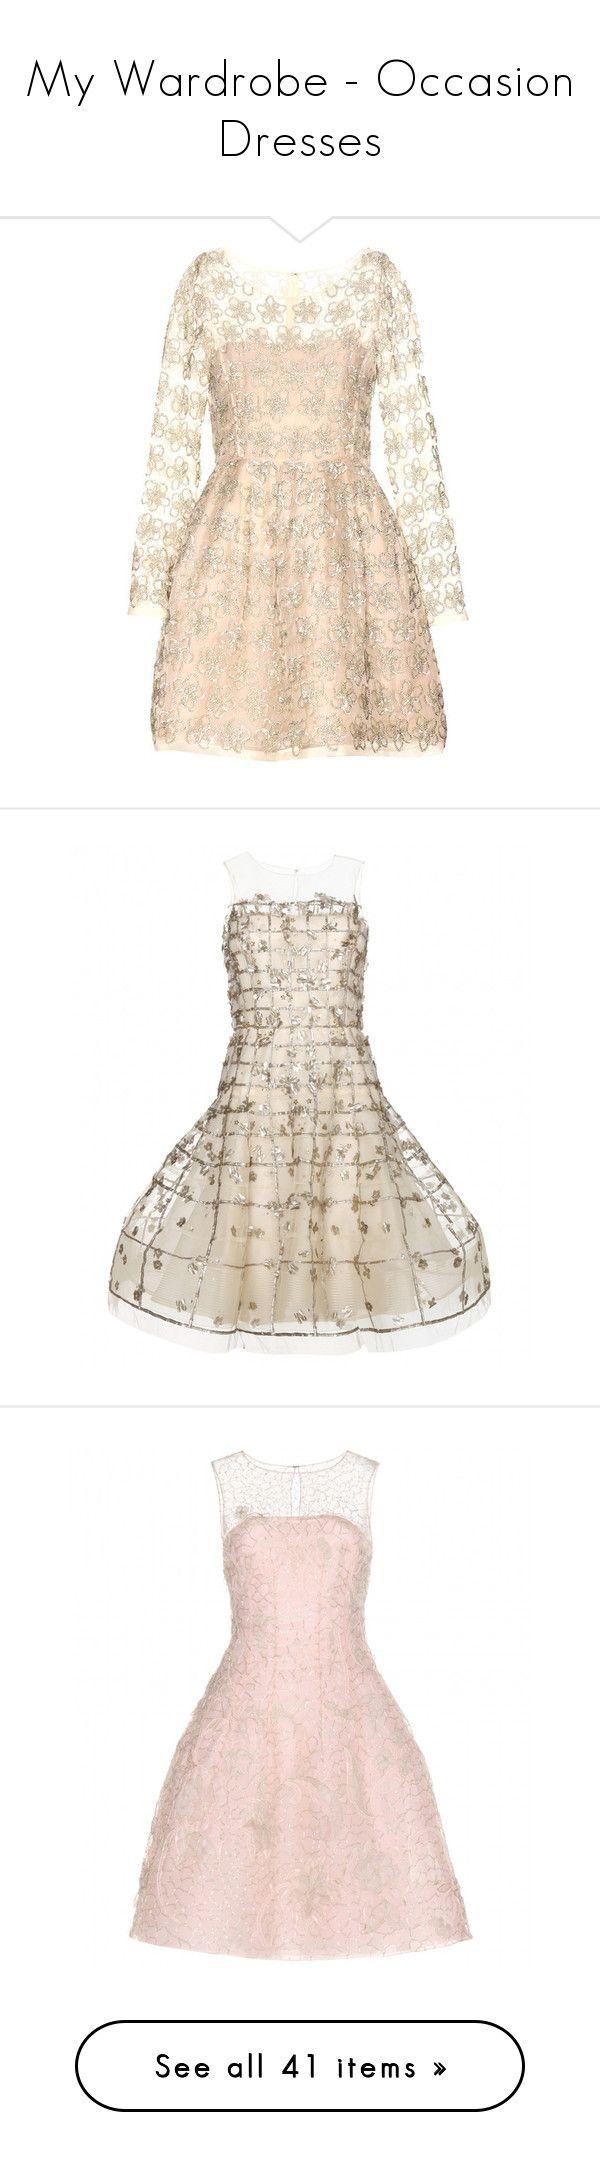 """My Wardrobe - Occasion Dresses"" by ann4-kar1na ❤ liked on Polyvore featuring dresses, oscar de la renta, beige, embellished short dress, mini dress, beige short dress, silk organza dress, oscar de la renta cocktail dress, gold and broderie dress"